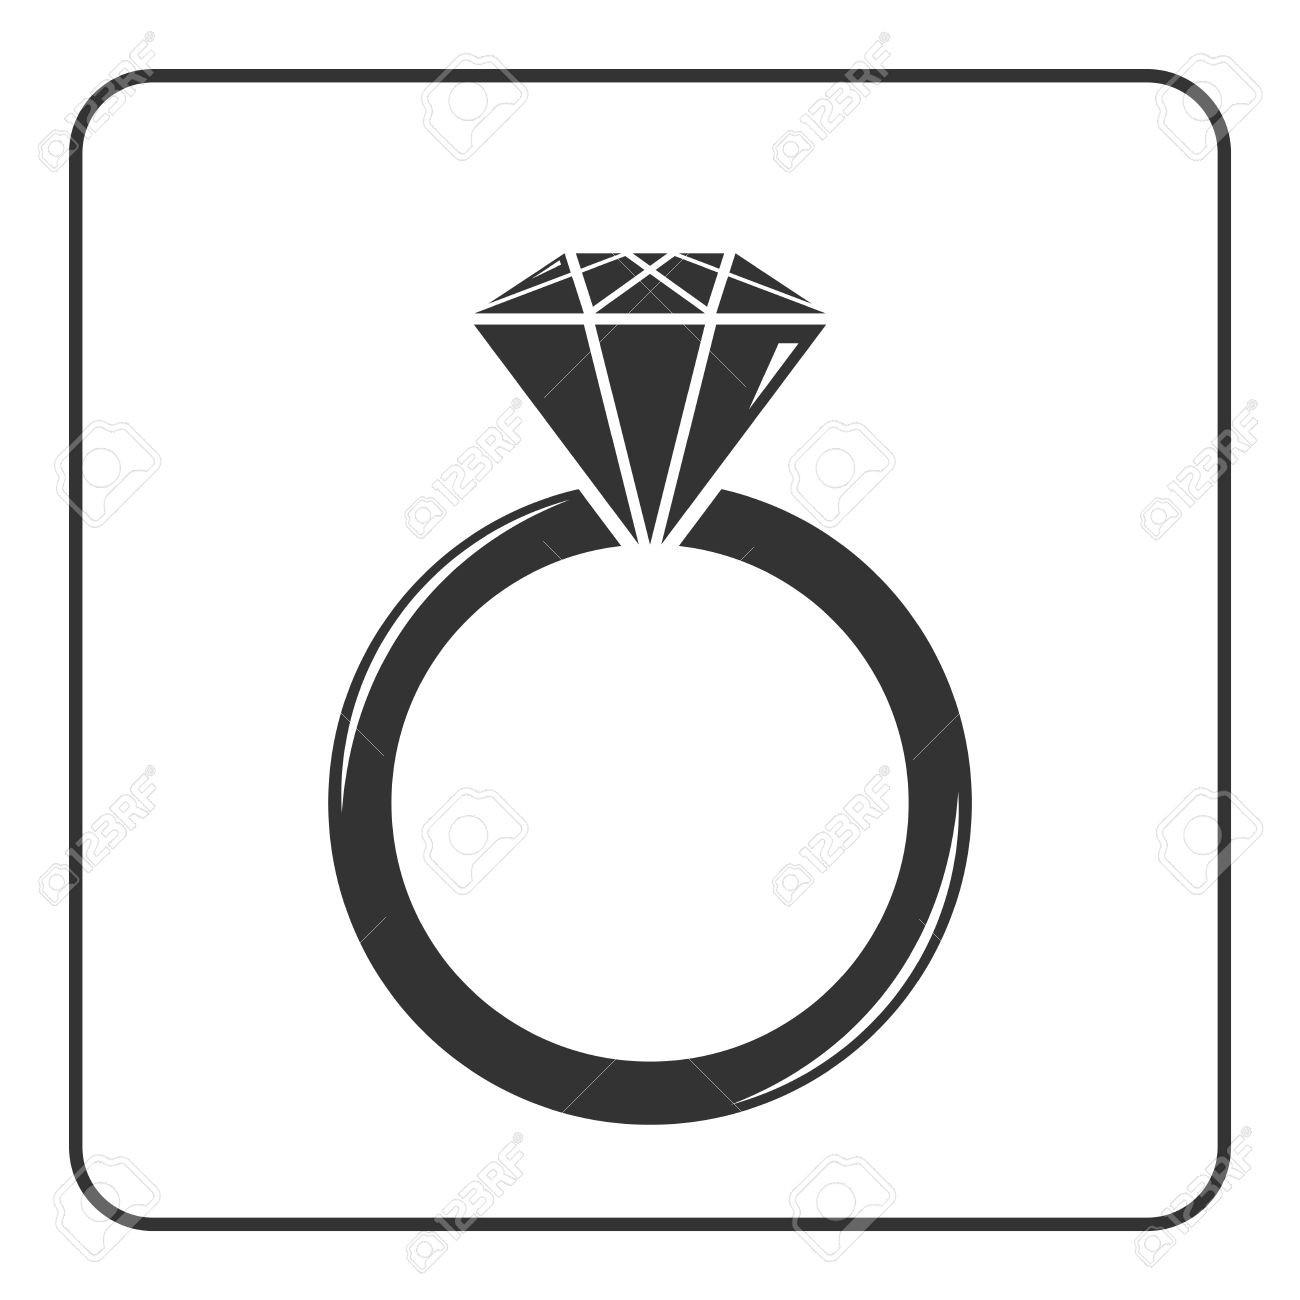 1300x1300 Wedding Ring Vector Wedding Ring Silhouette Botanicus Interactic